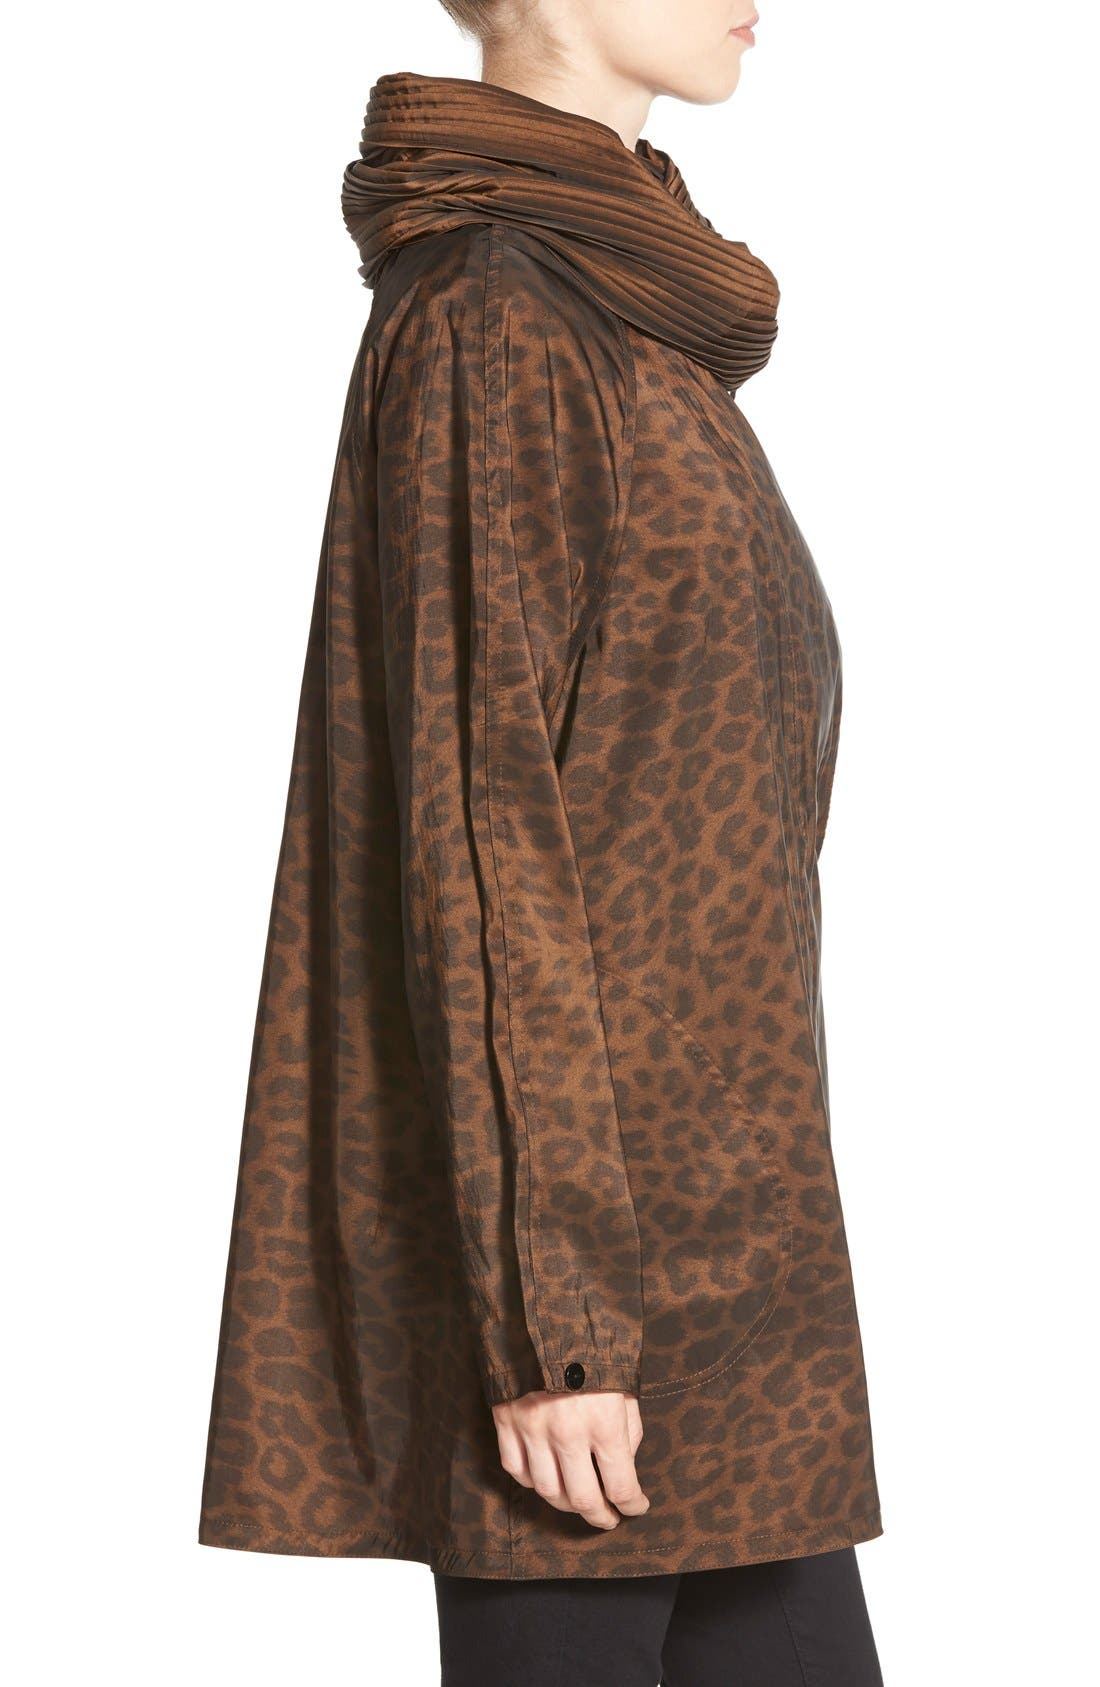 'Mini Donatella Leopard' Reversible Pleat Hood Packable Travel Coat,                             Alternate thumbnail 11, color,                             202